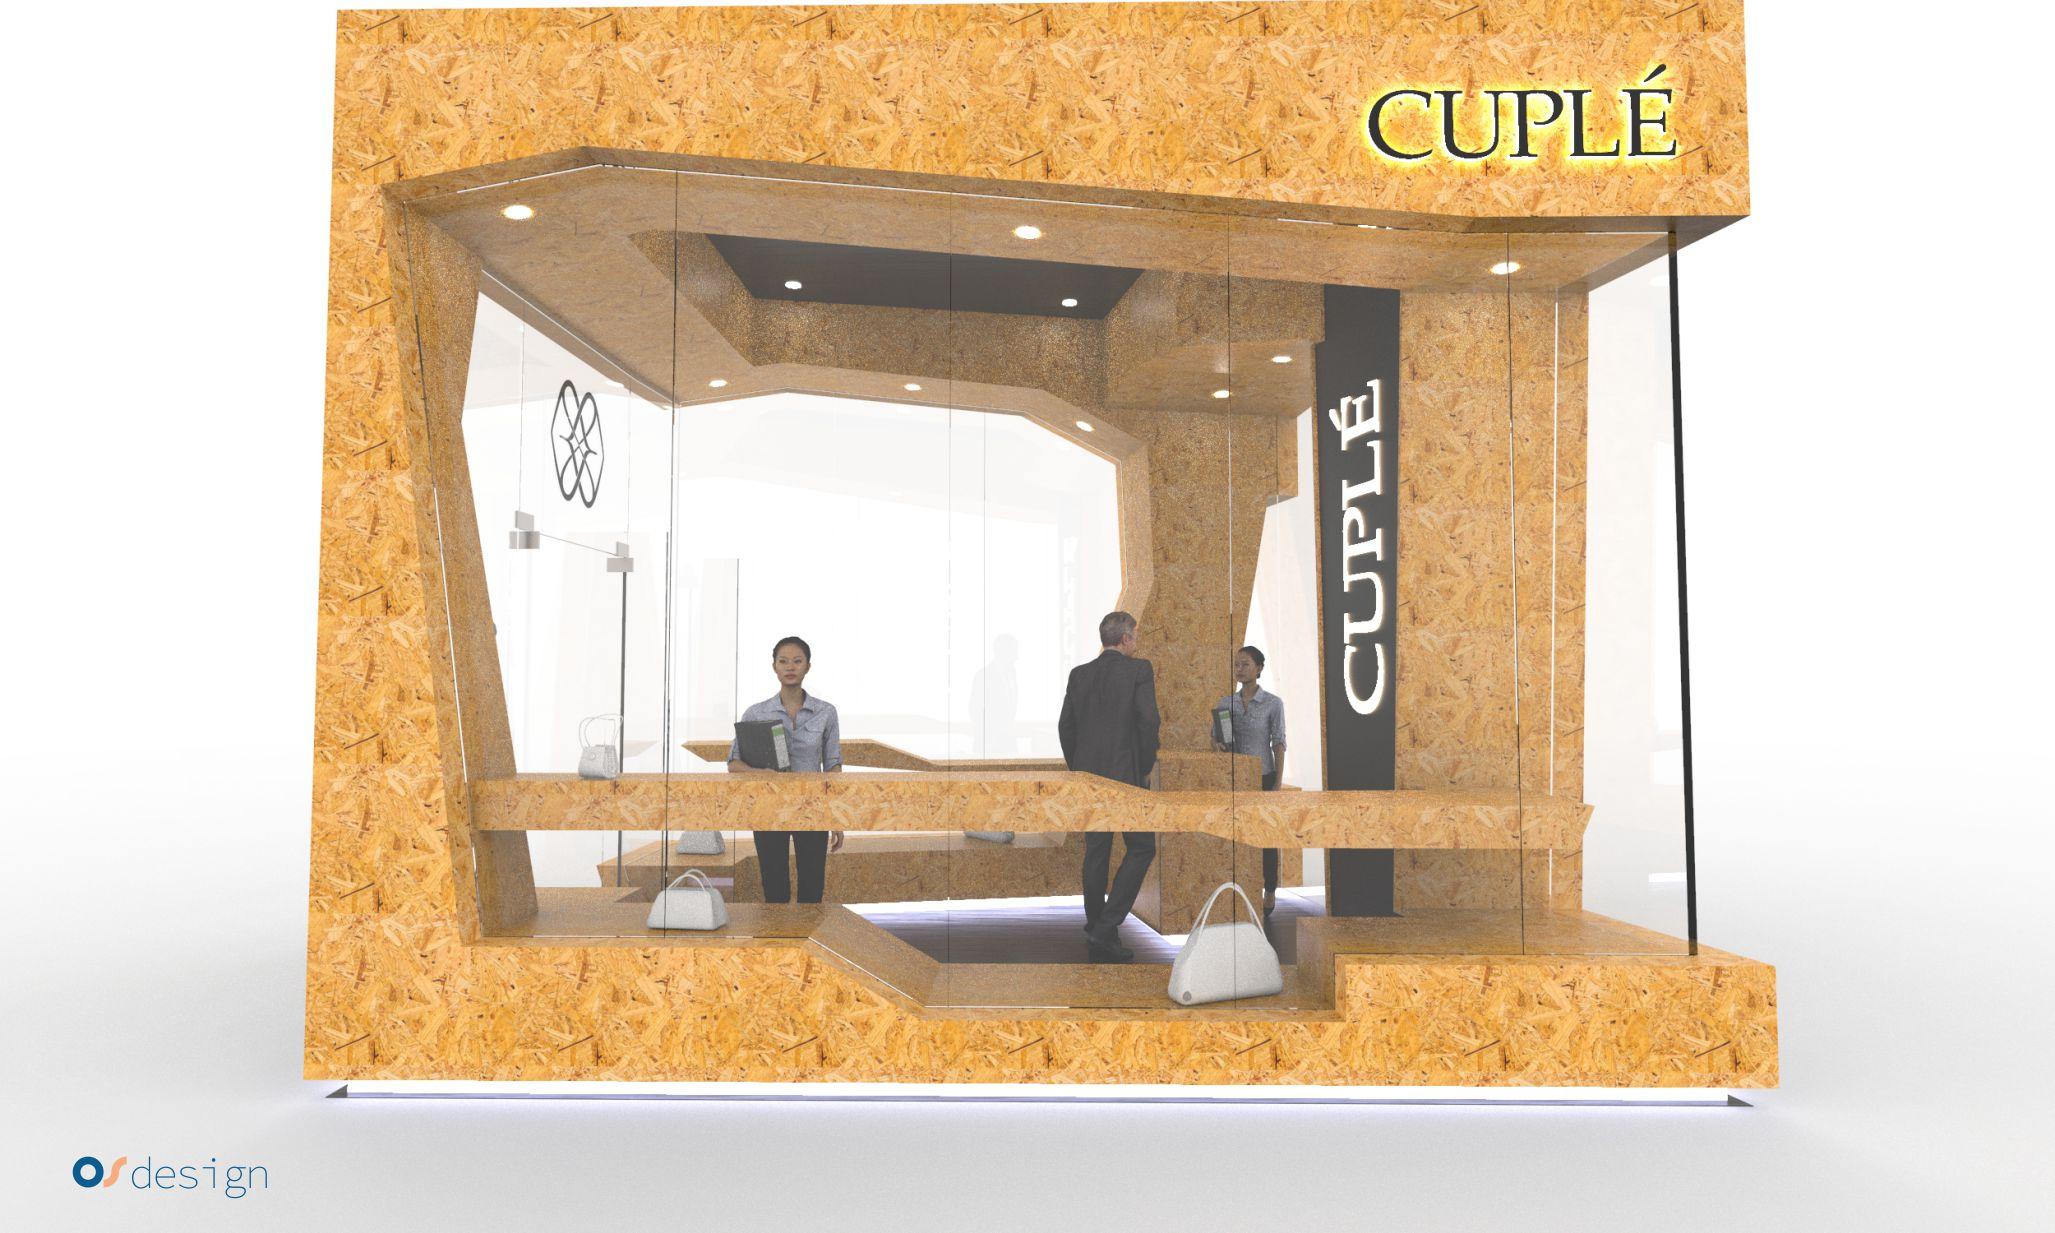 cuple_02c